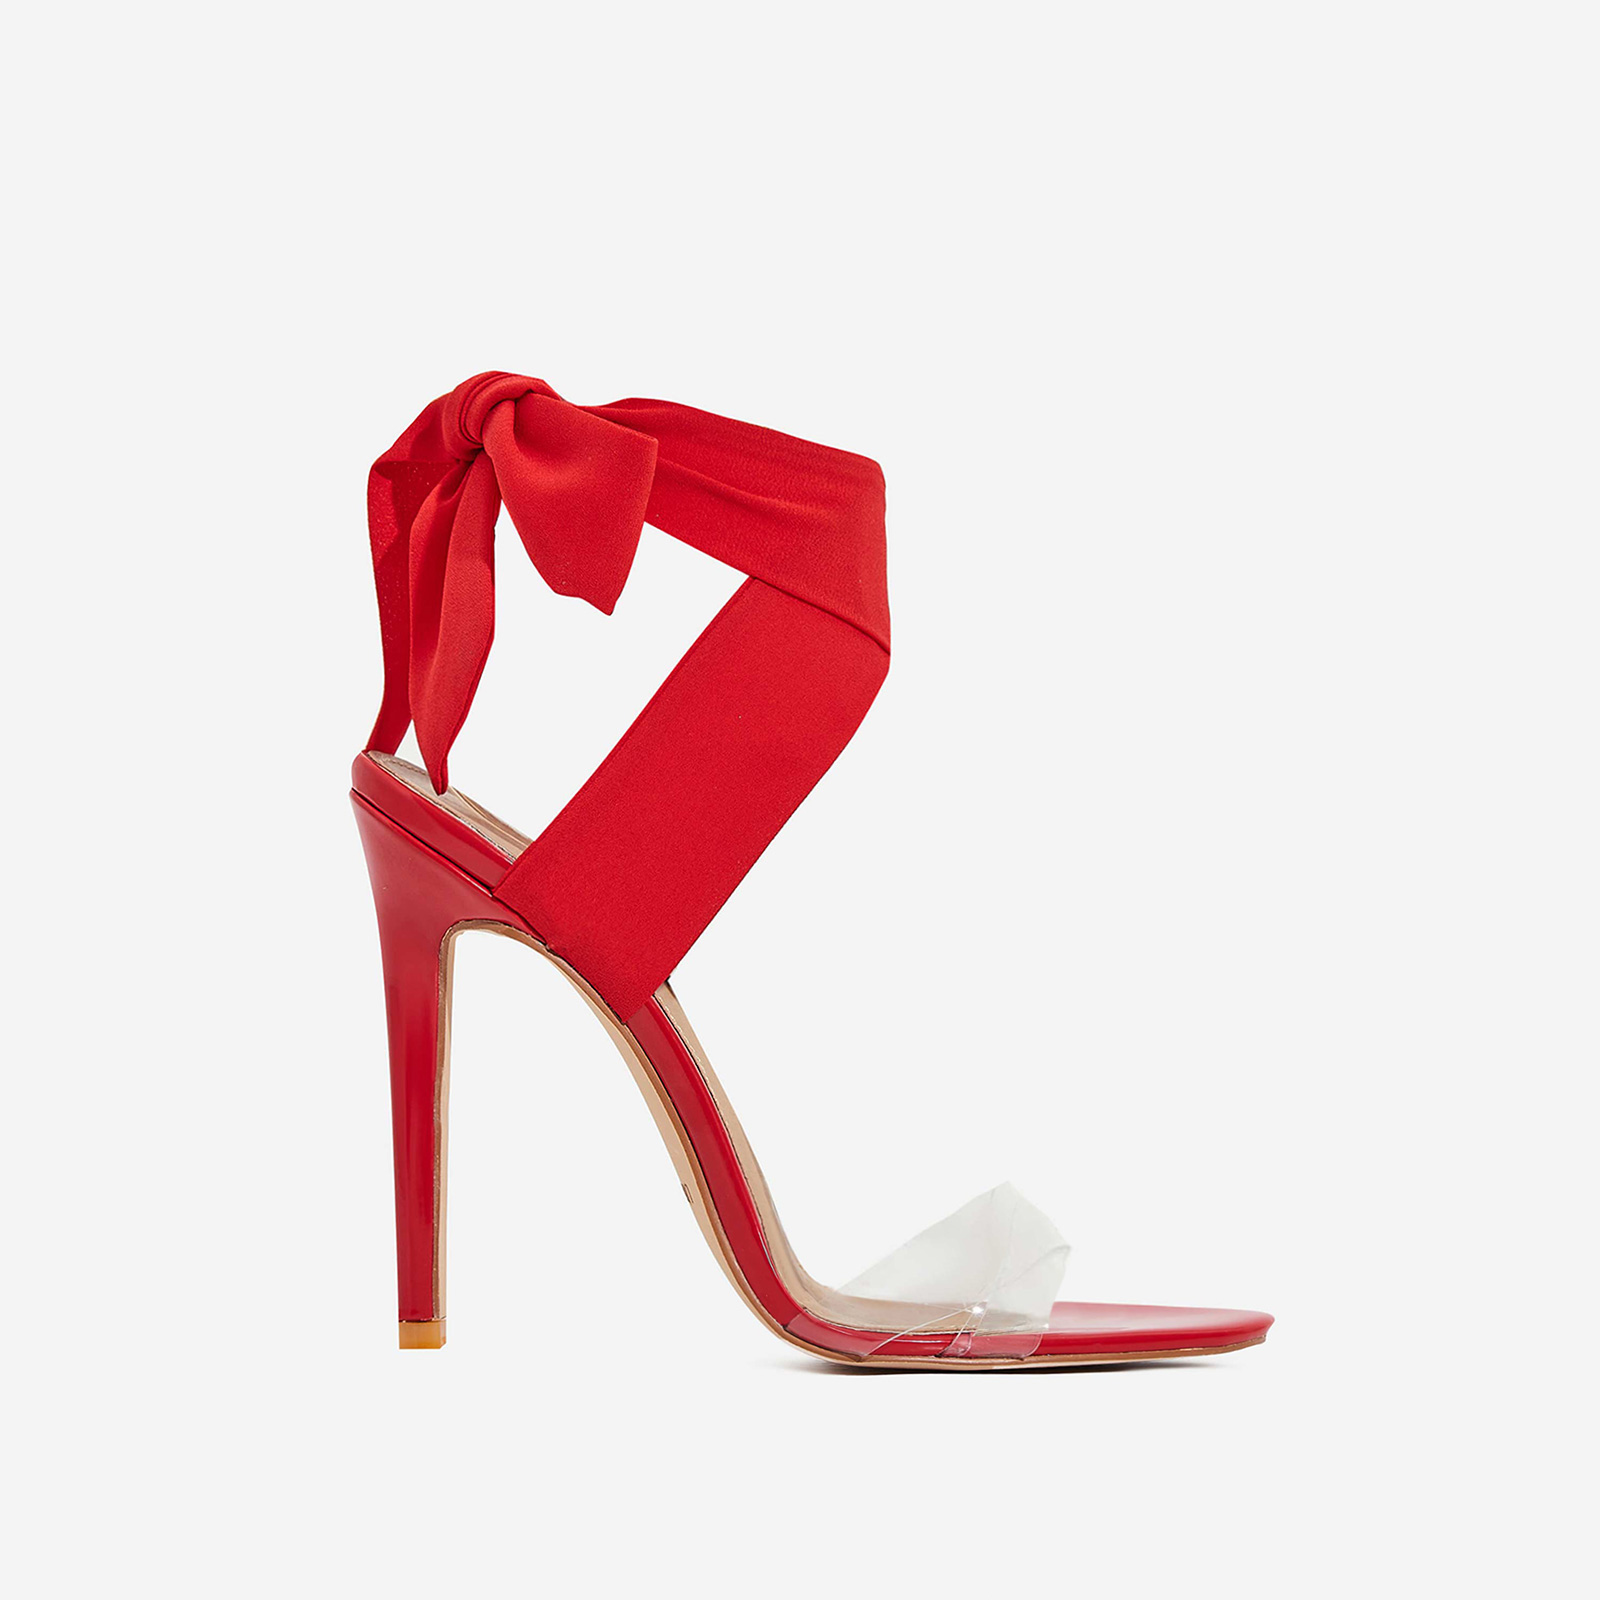 Zabi Ribbon Lace Up Perspex Heel In Red Pat